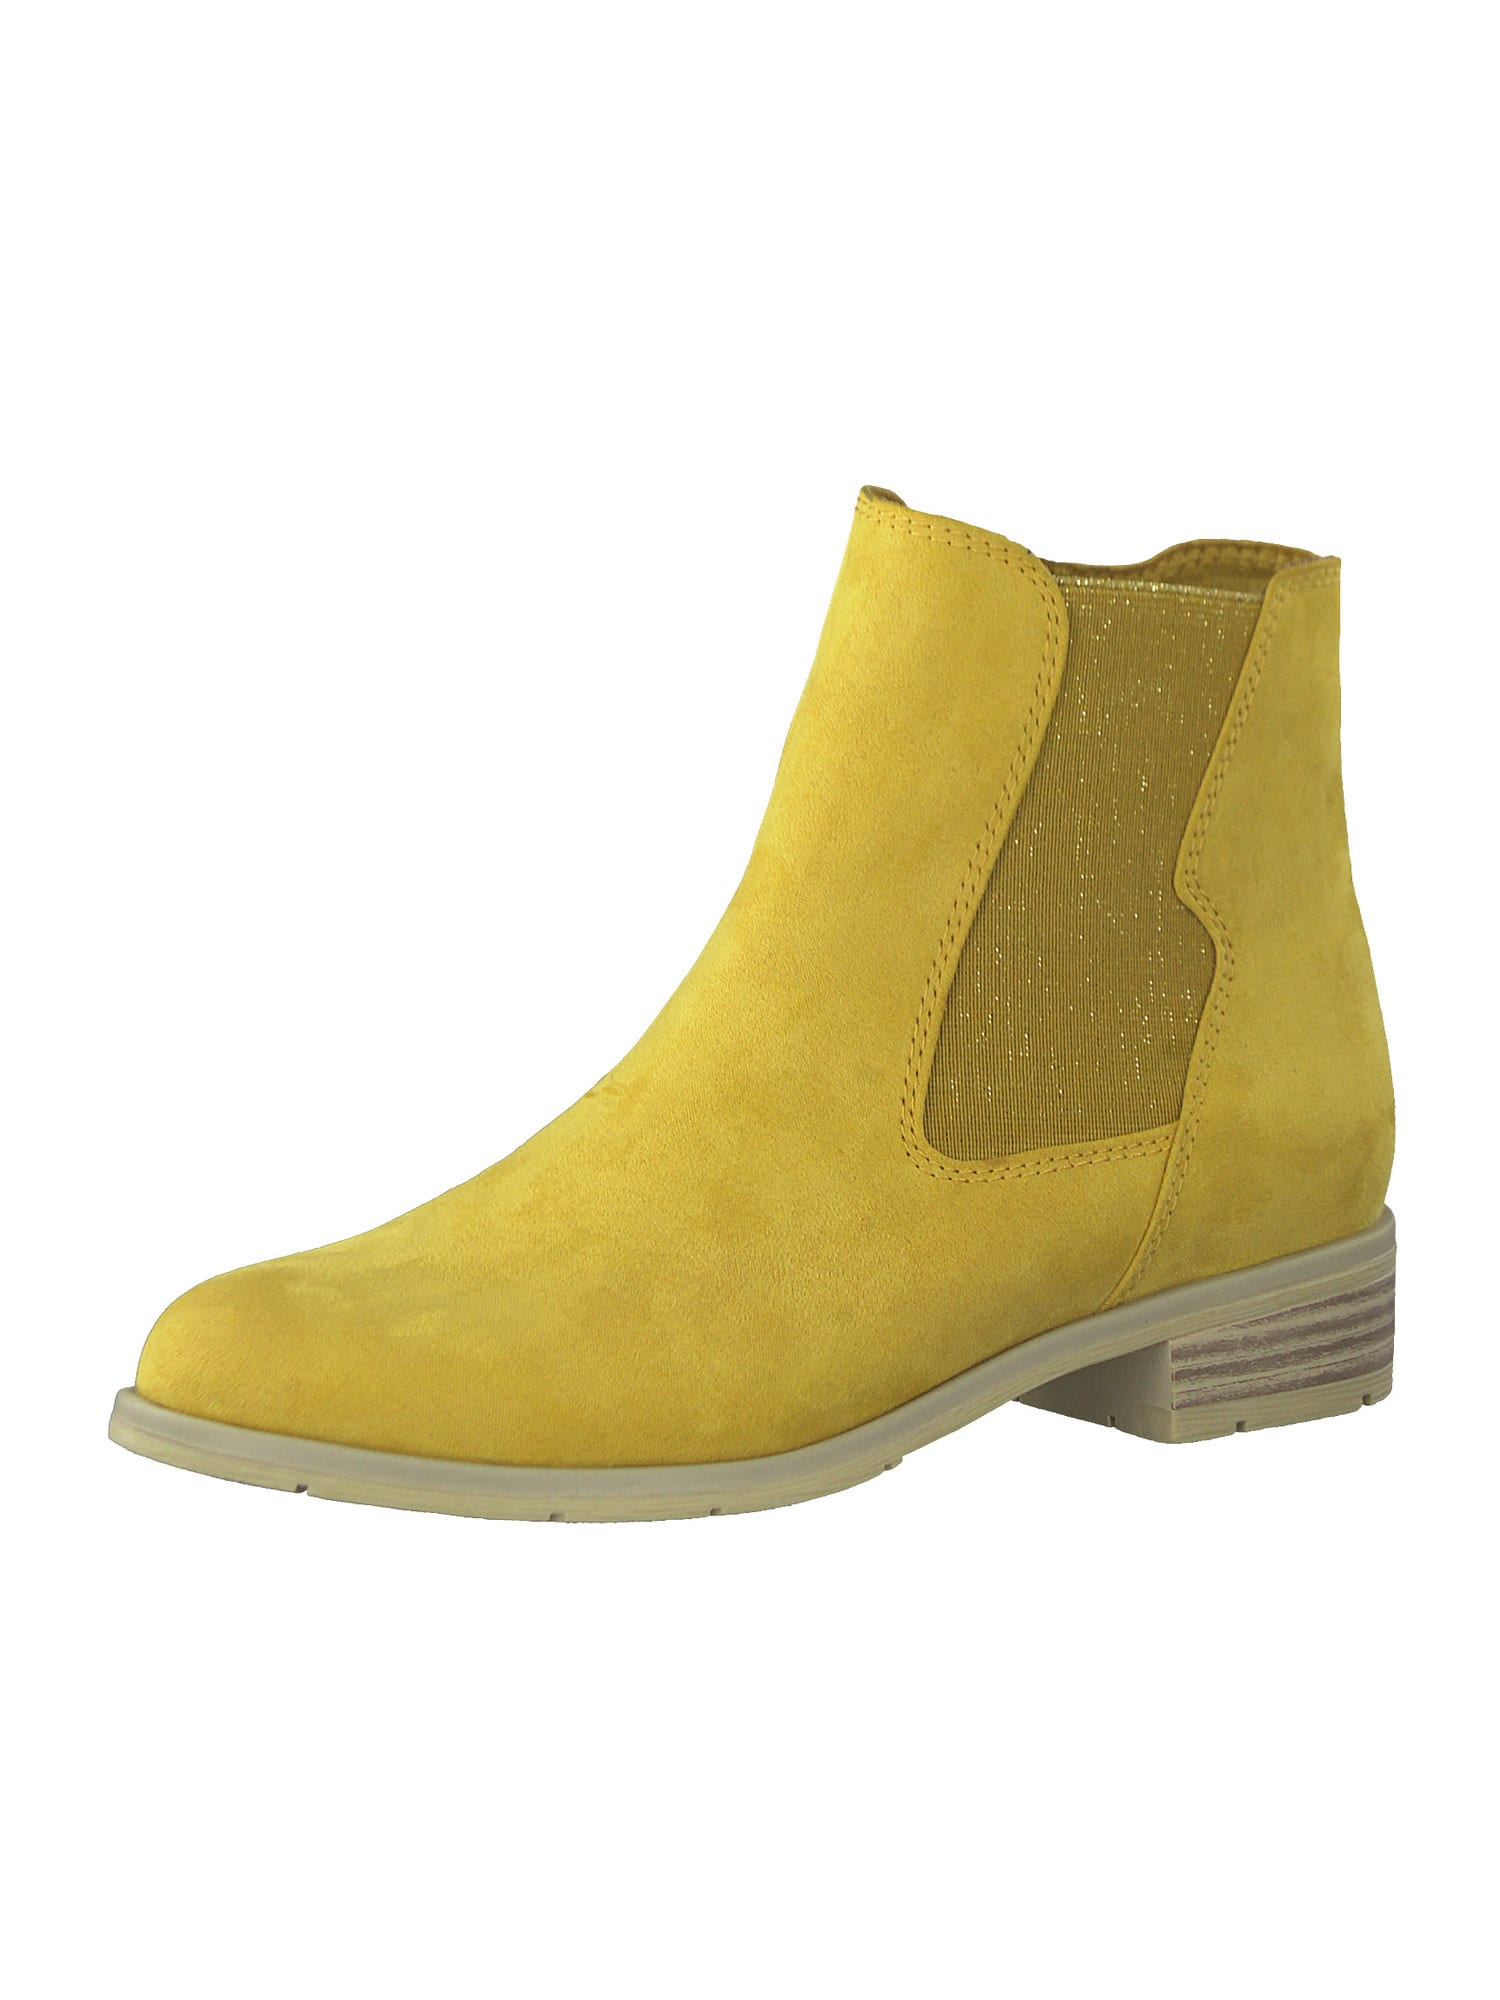 MARCO TOZZI Aulinukai geltona